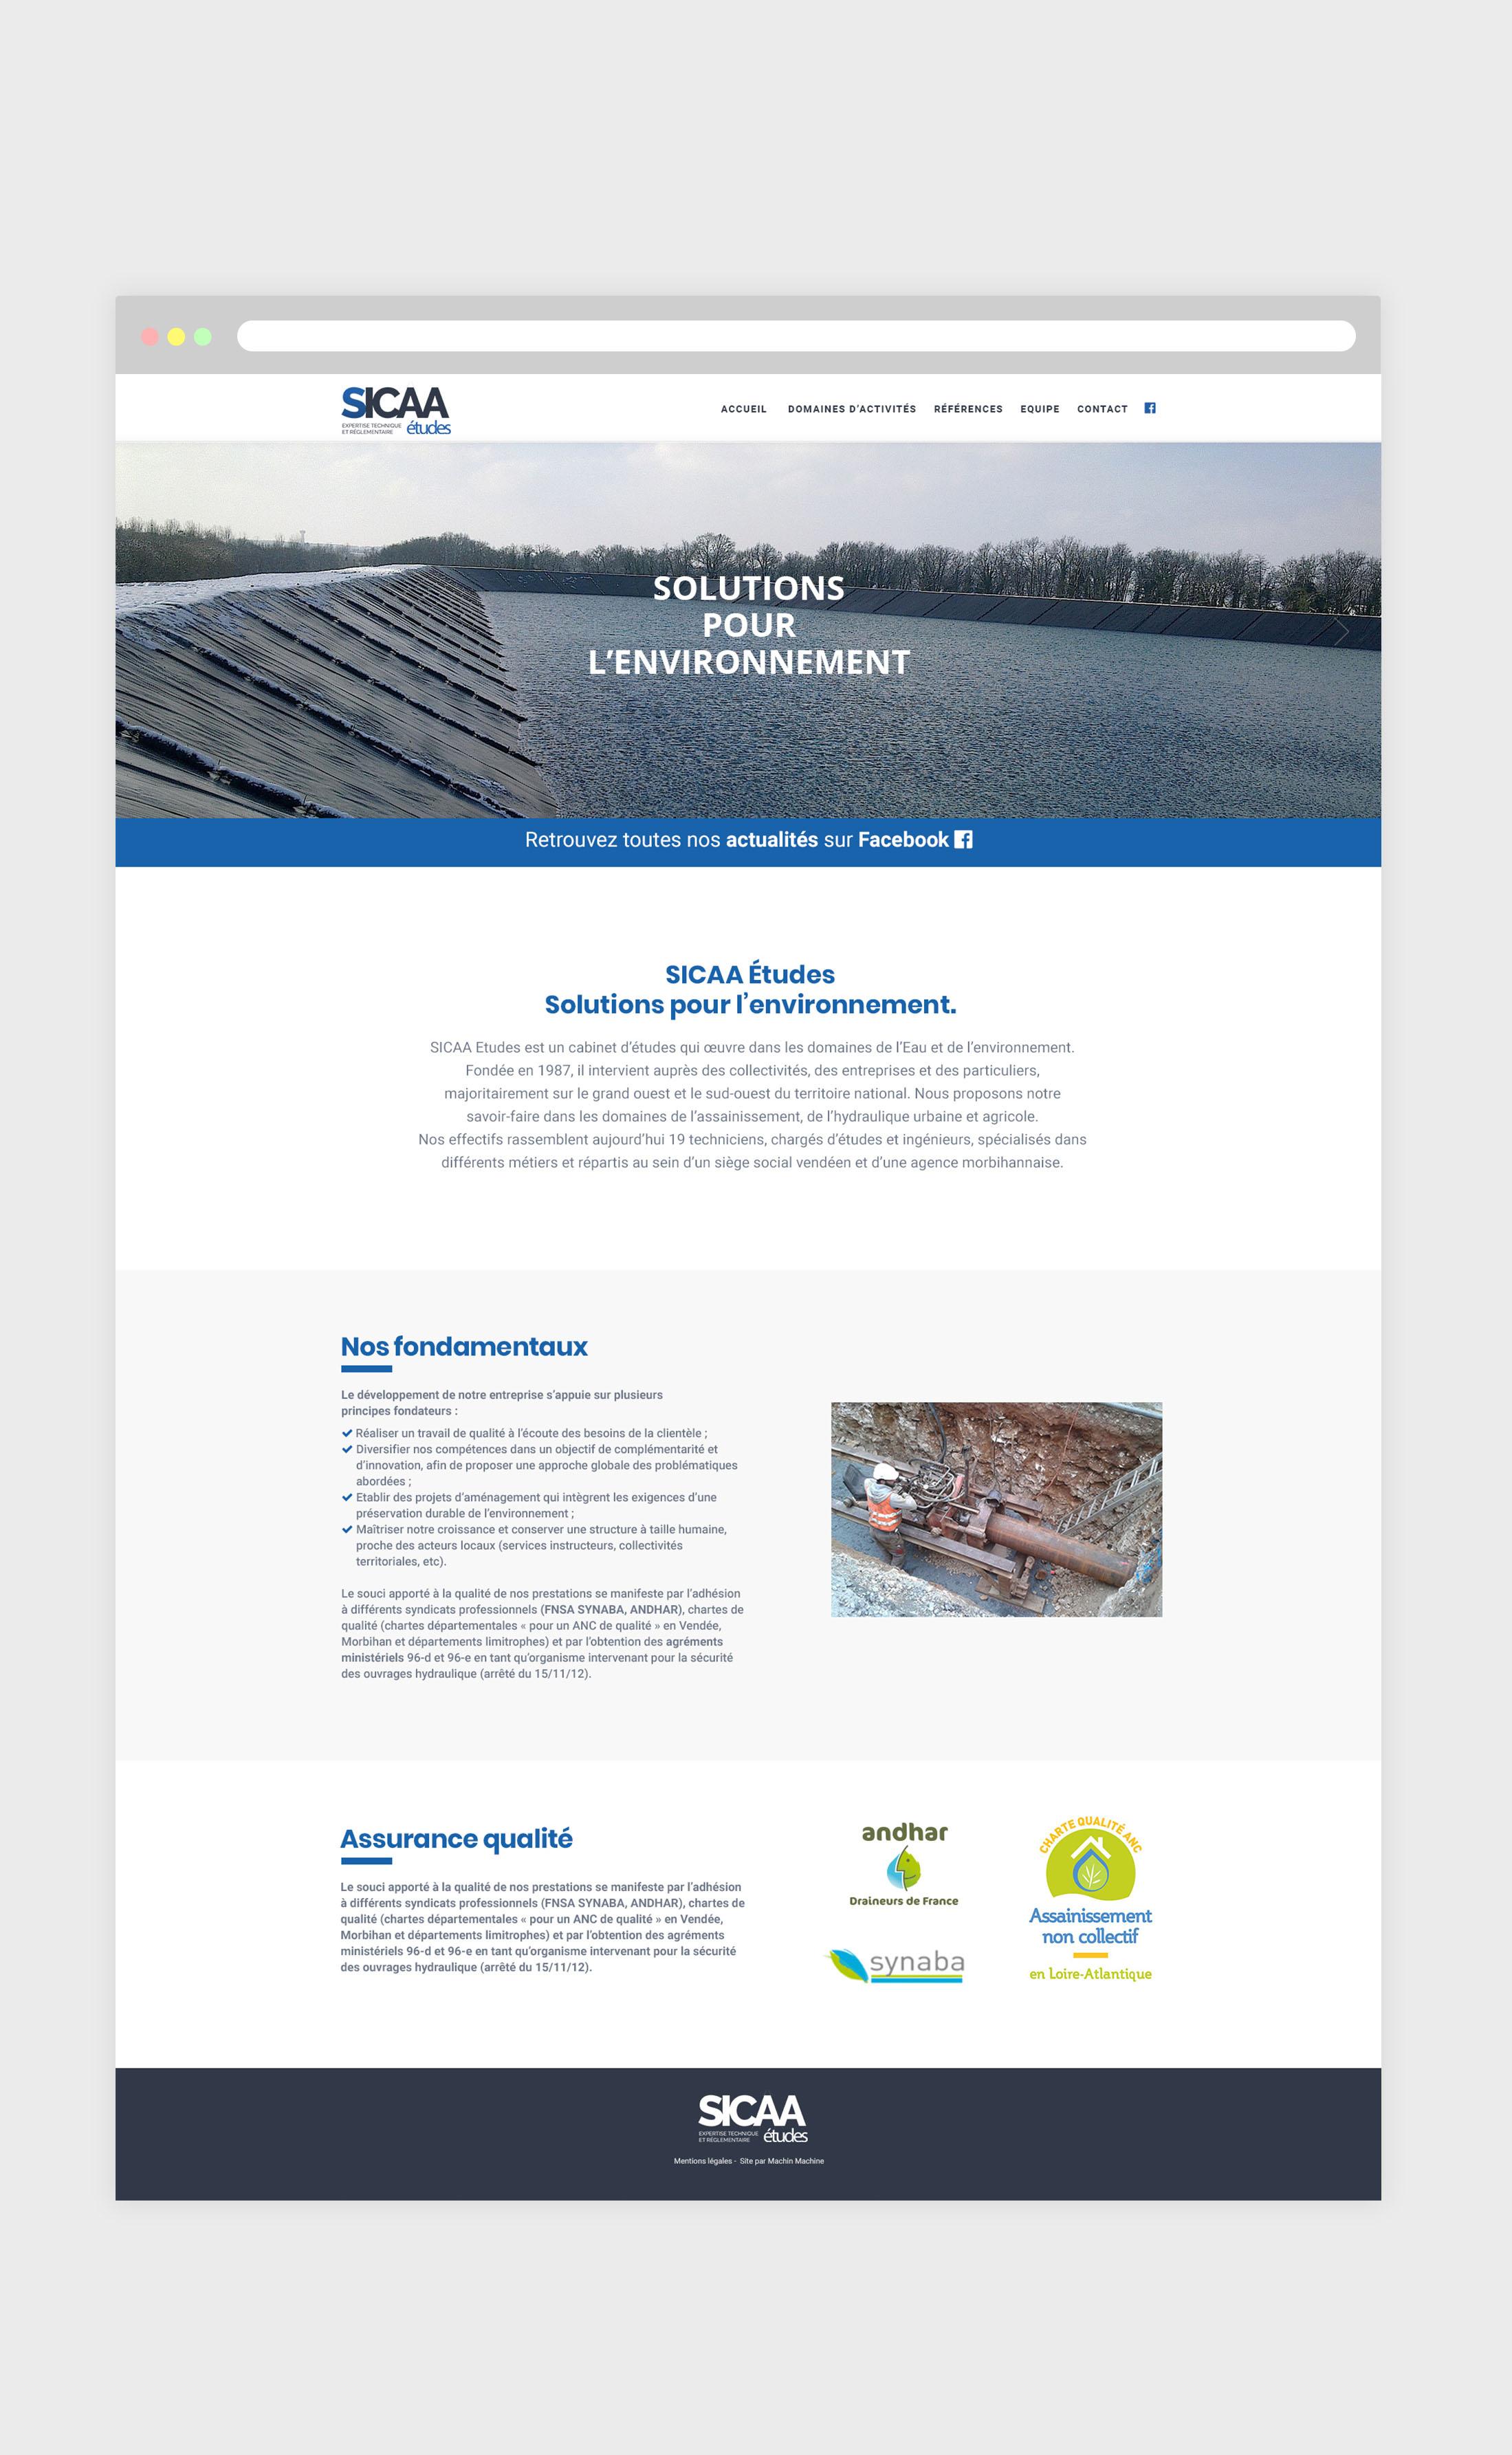 Agence web Vendée - creation site internet wordpress - freelance pour pme - entreprise